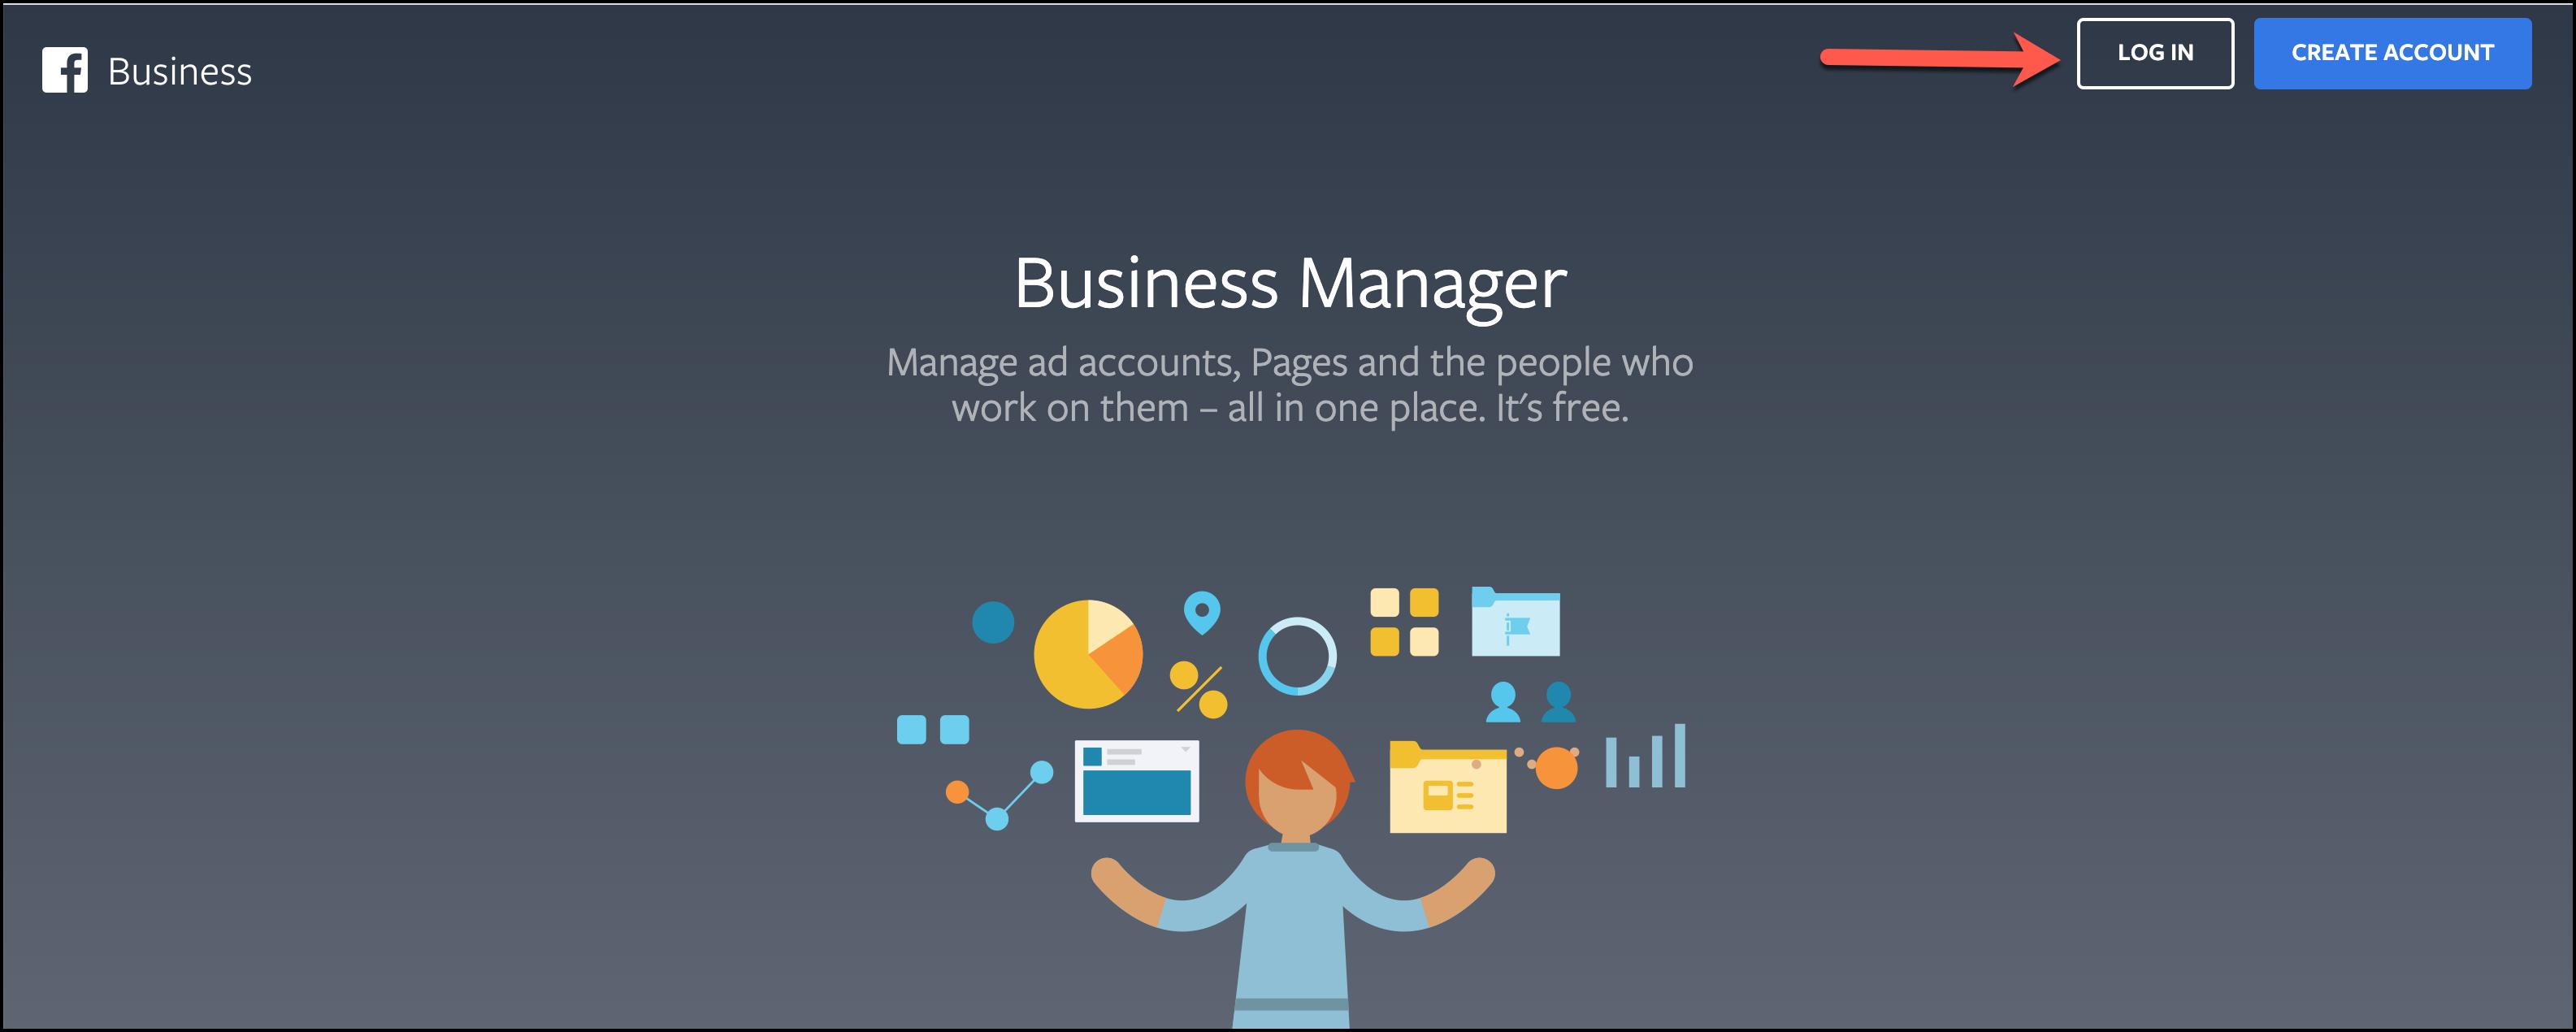 Facebook Business Manager Log in